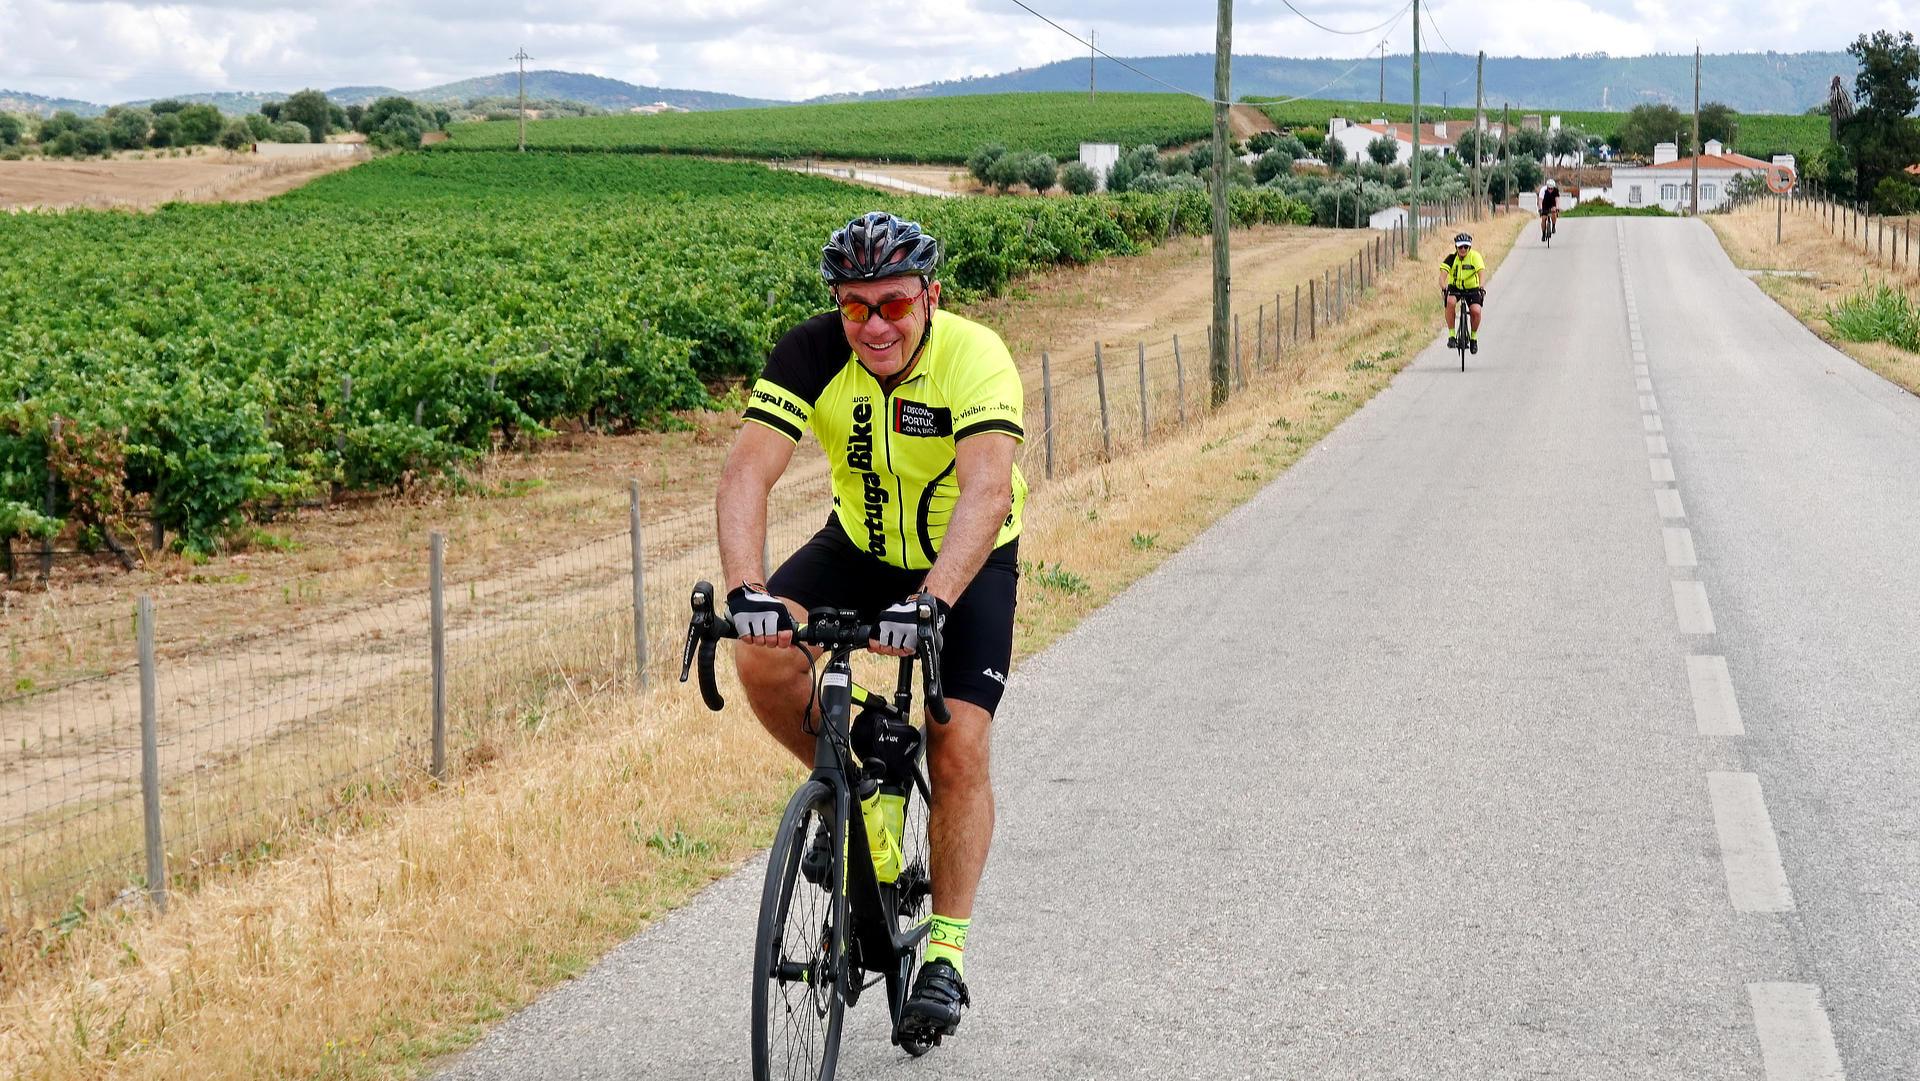 Cycling the Alentejo Wine Region vineyards Open Views